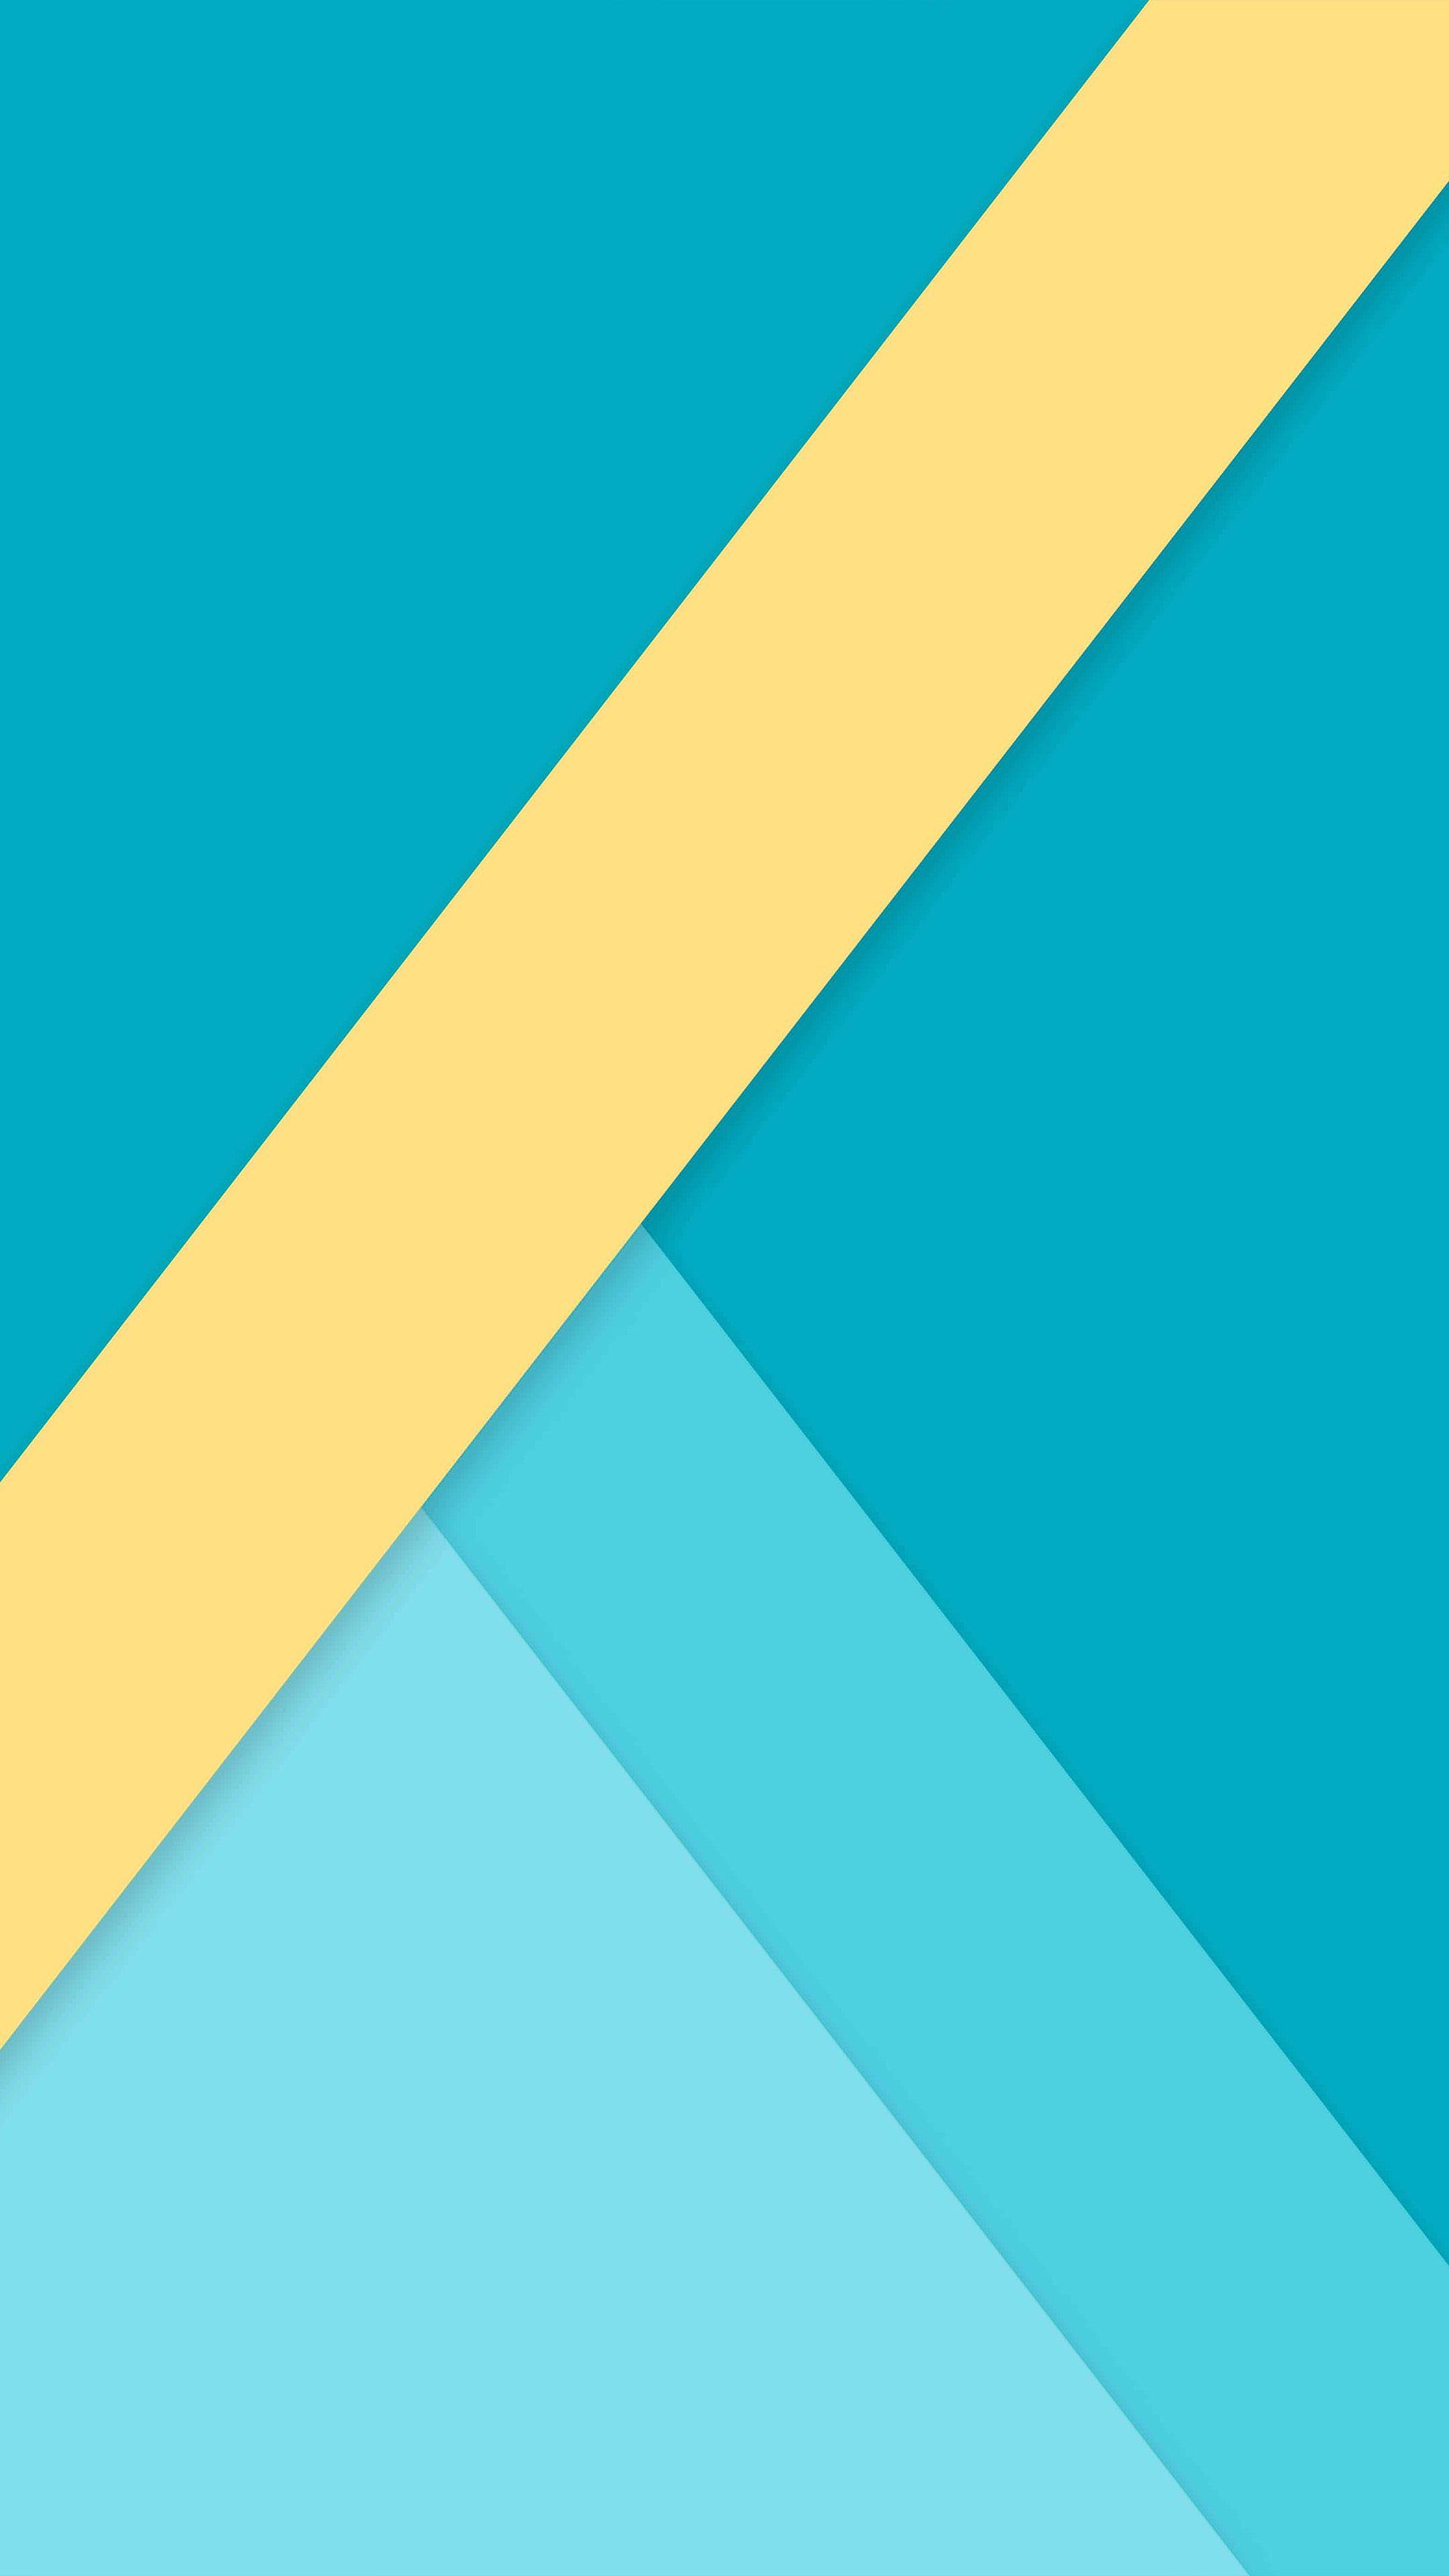 Geometric Blue Yellow 4k Ultra Hd Mobile Wallpaper Mobile Wallpaper Yellow Wallpaper Blue Wallpapers